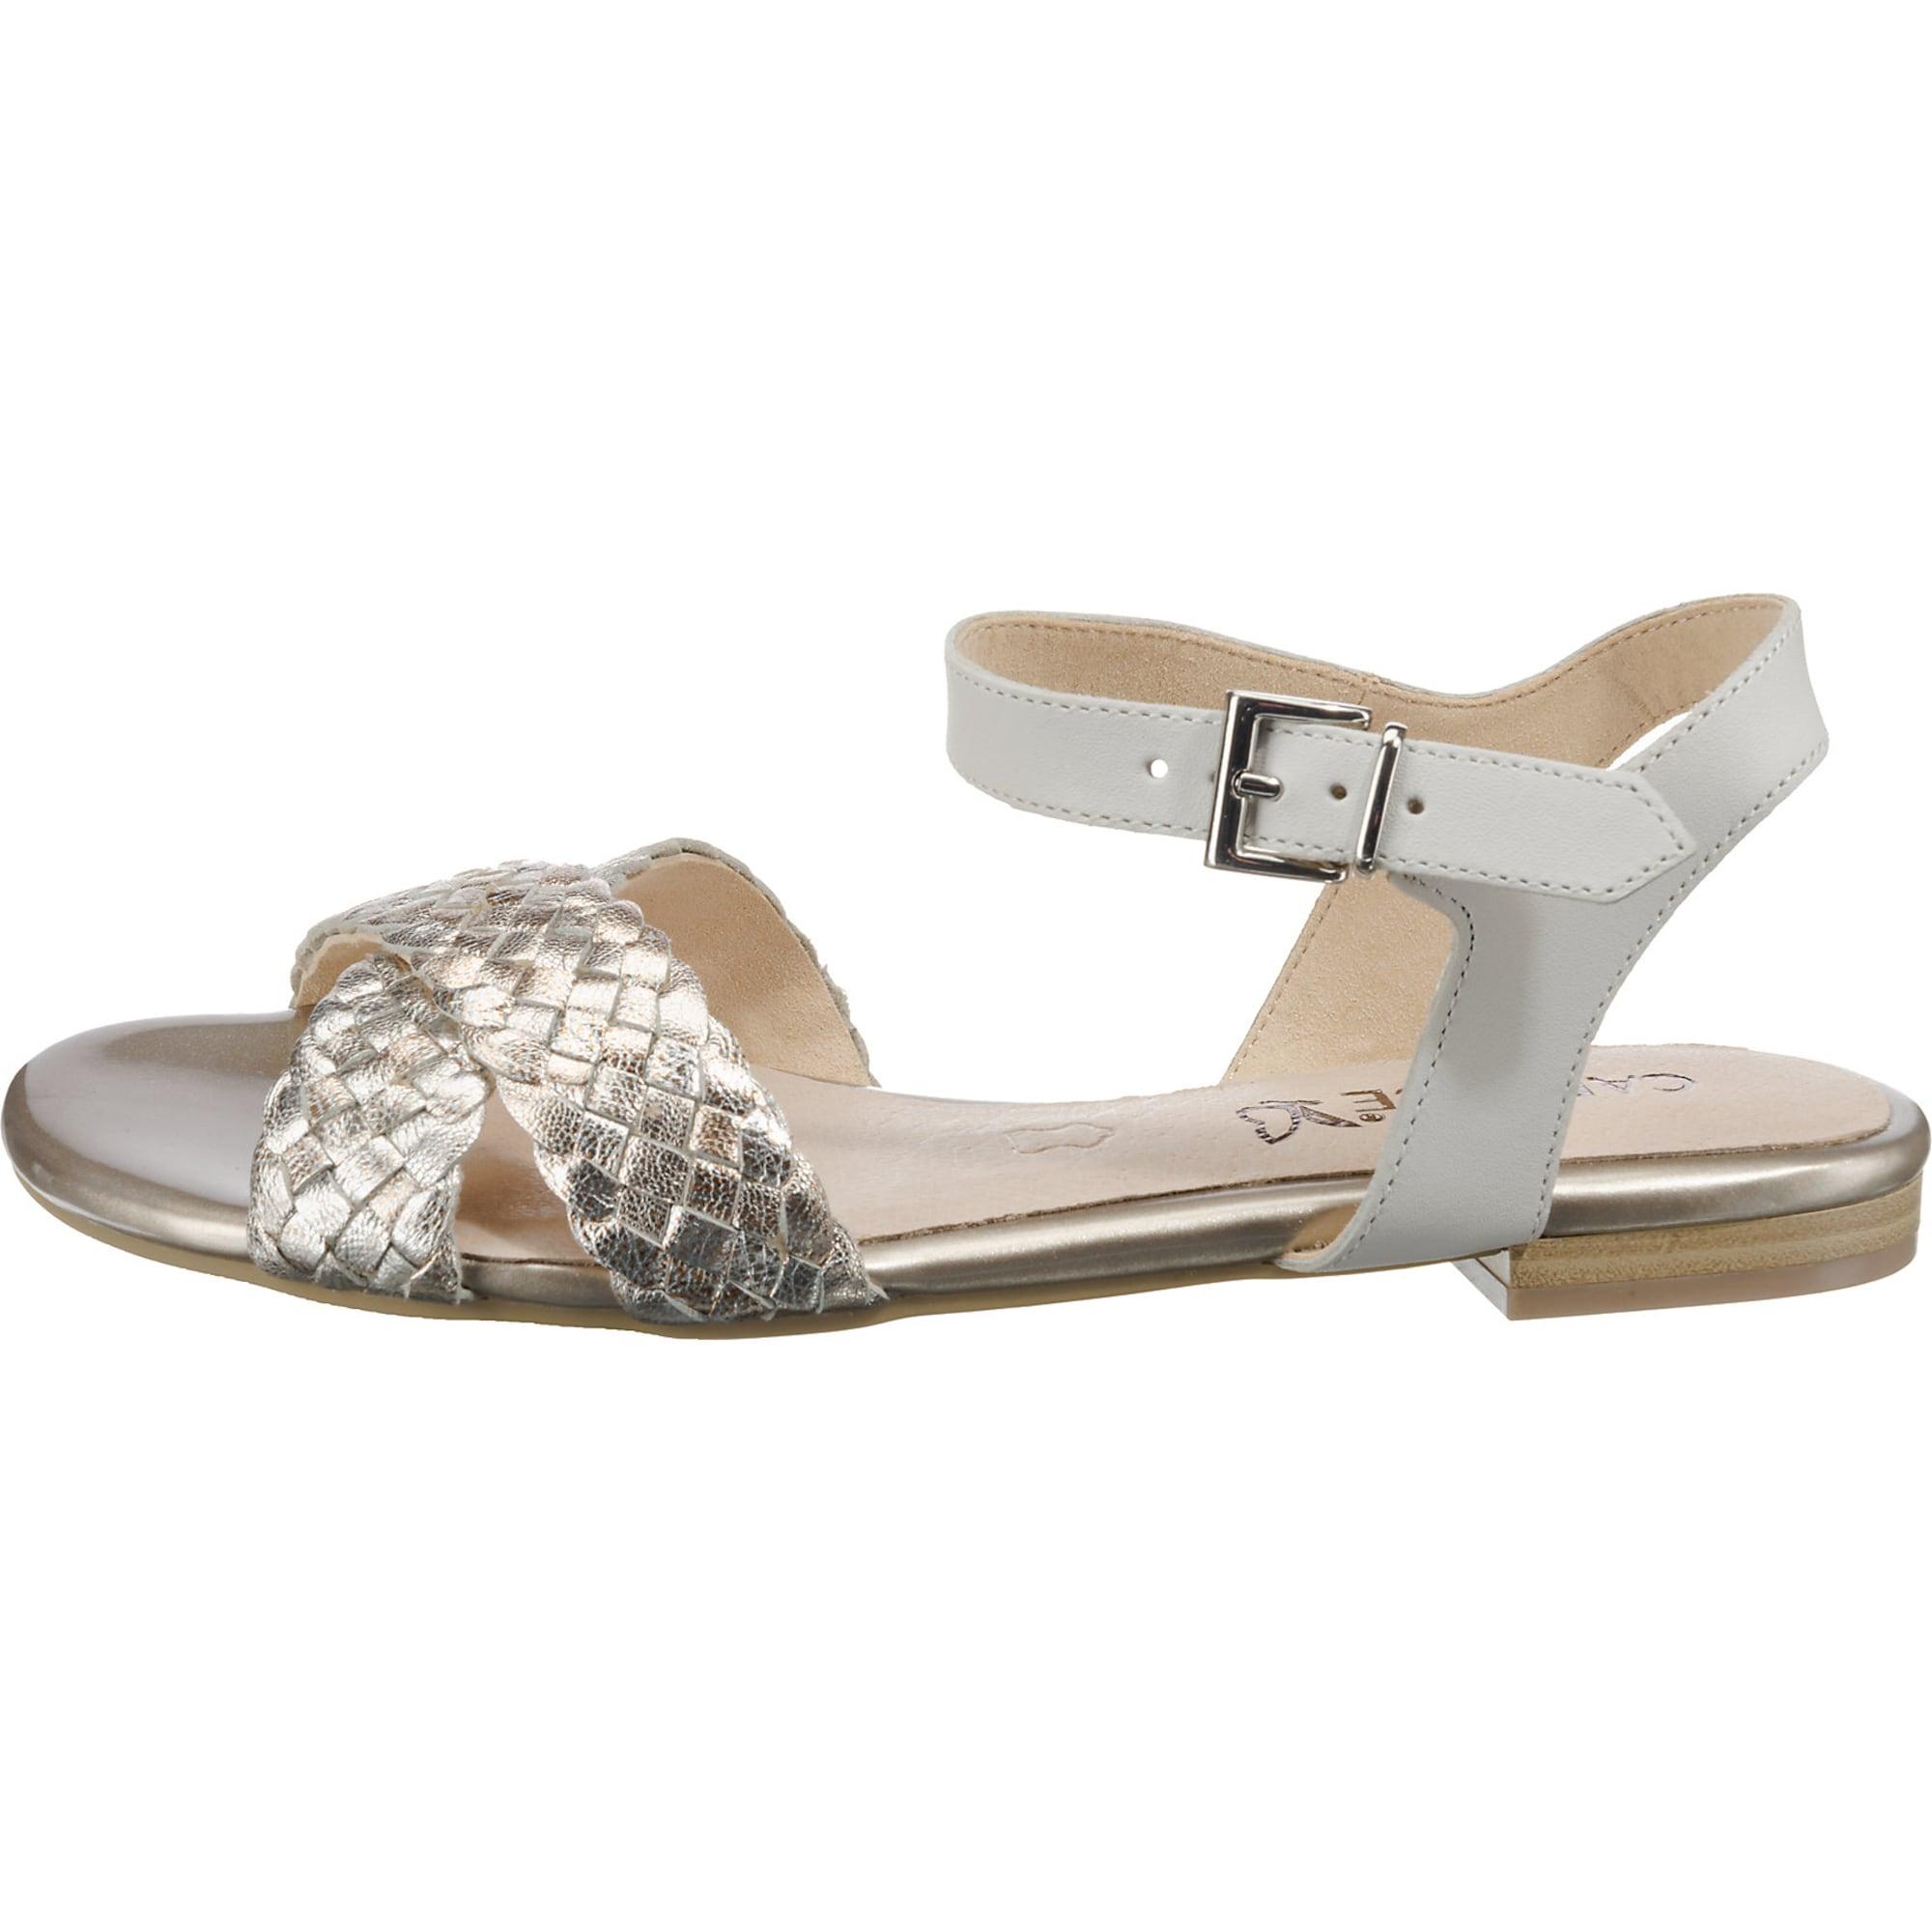 pretty nice d7edf c5b2b AboutYou | SALE Damen Caprice Sandalen gold, weiß ...